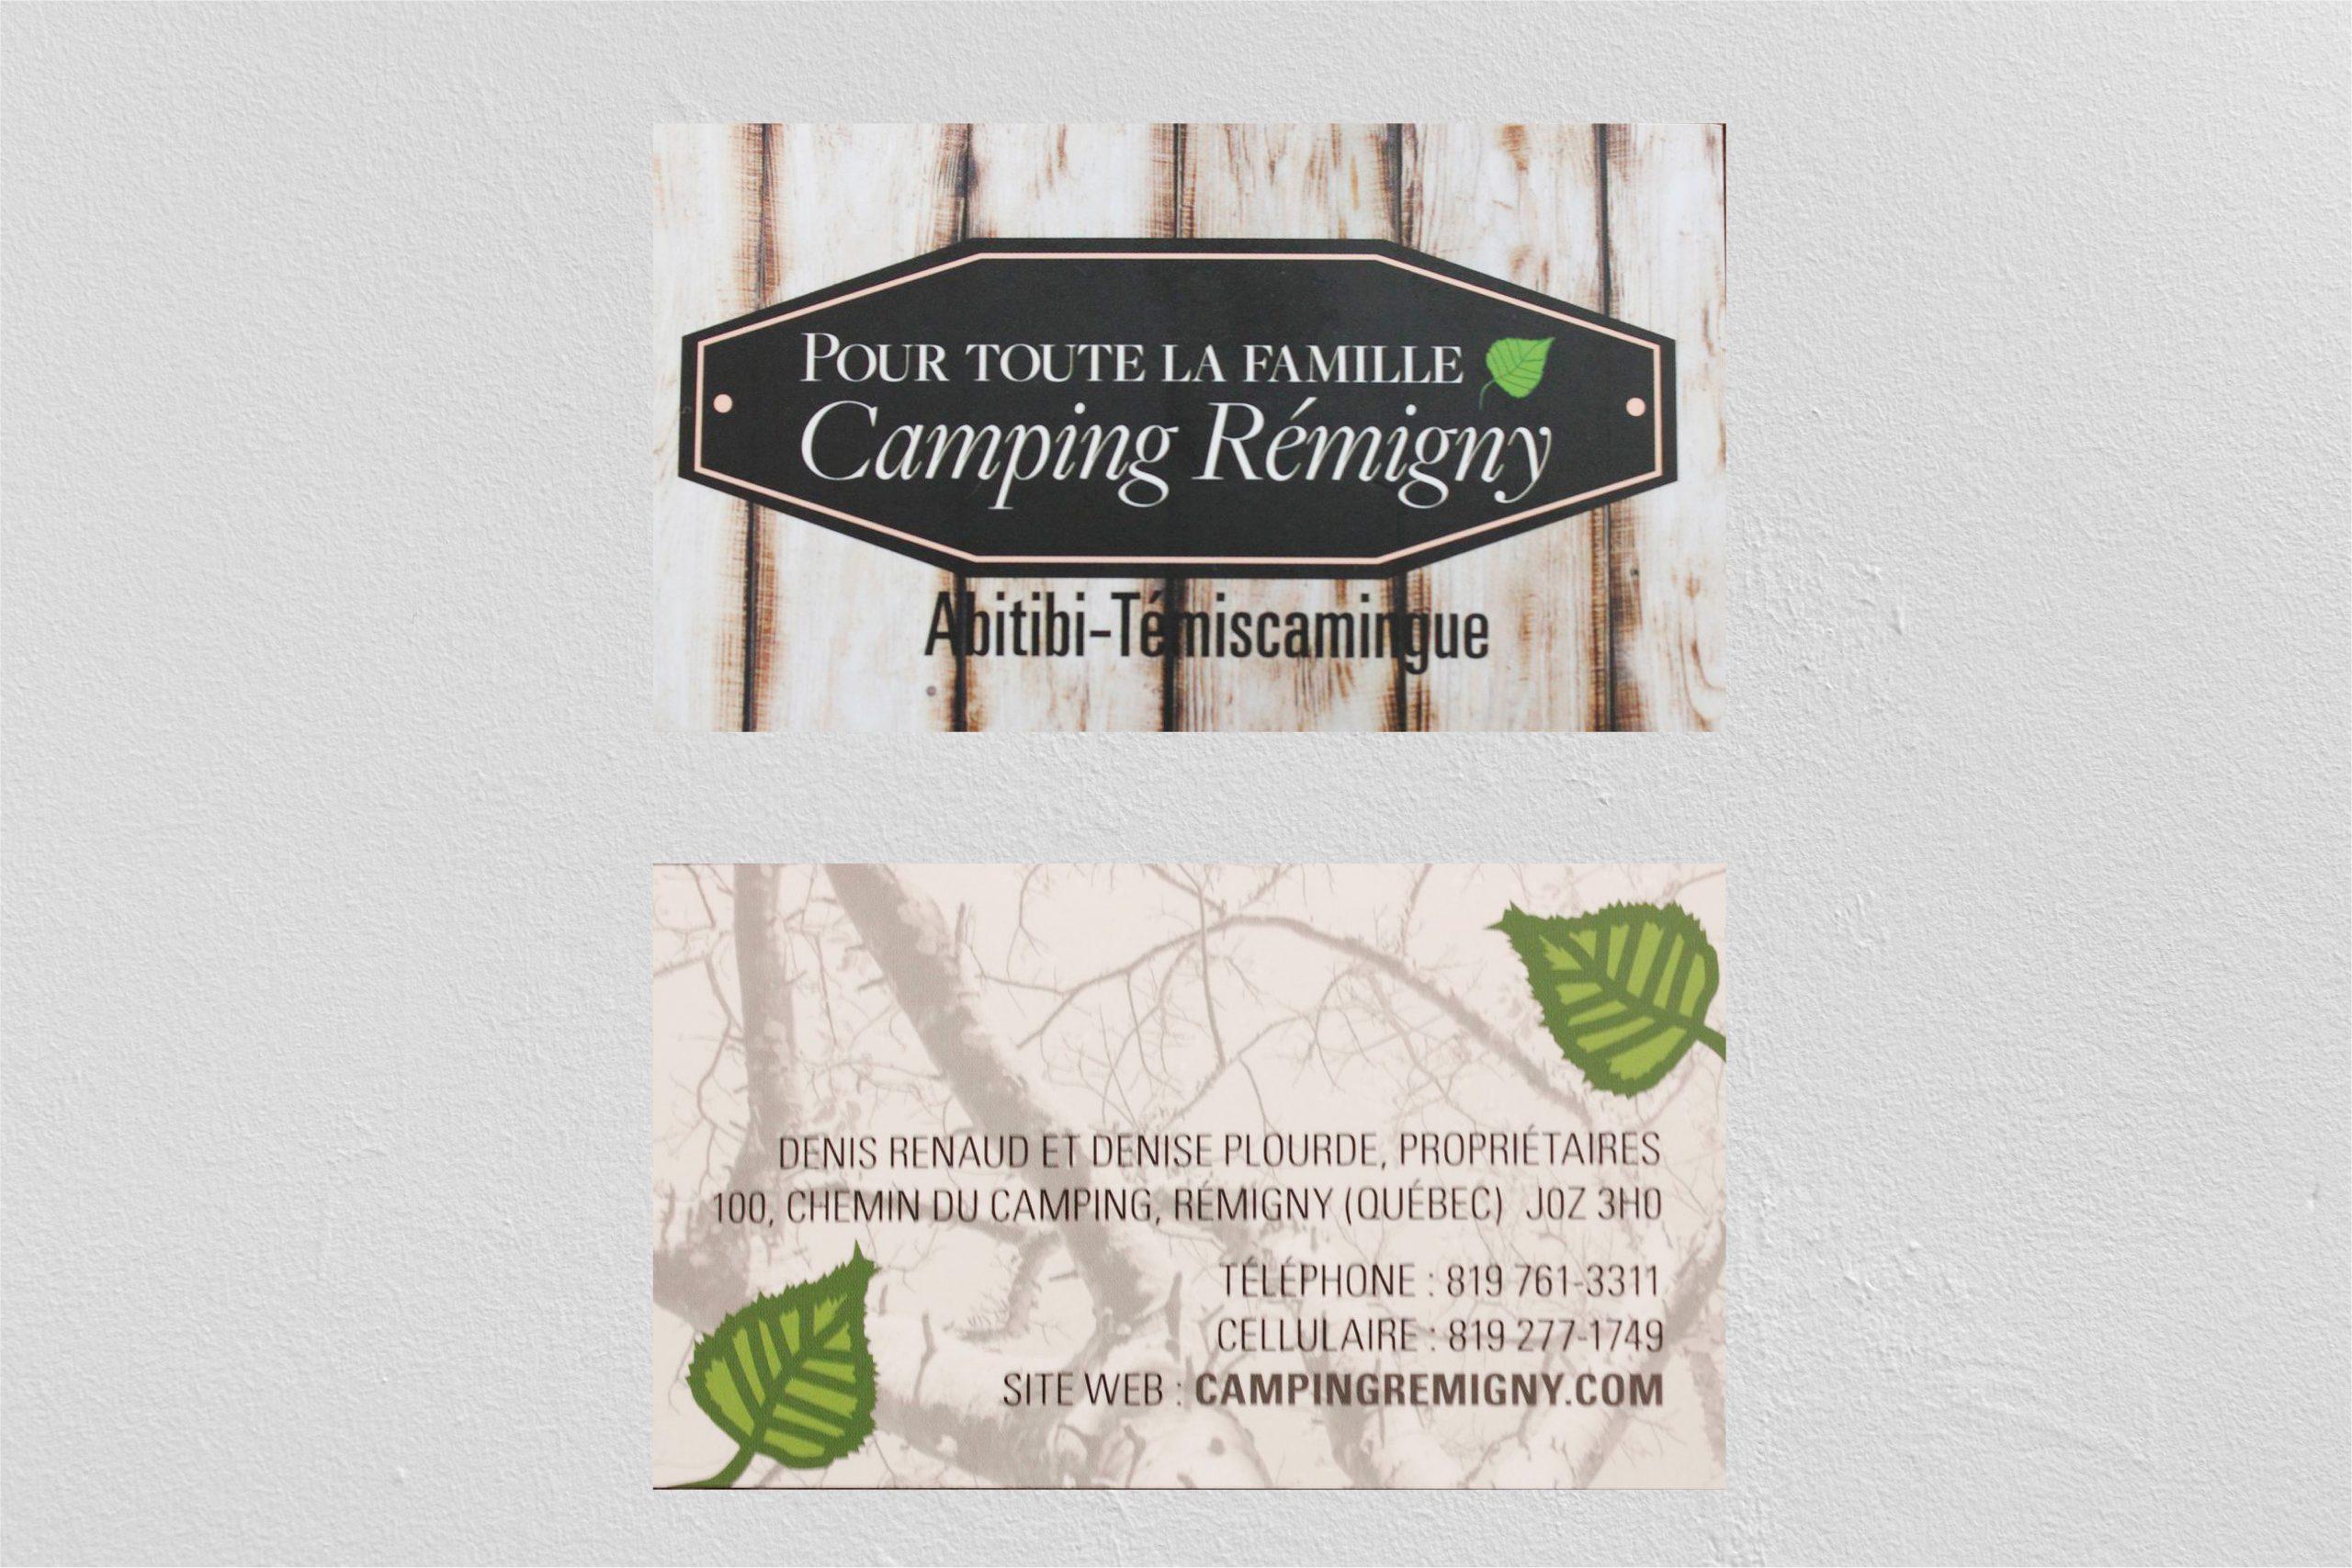 Carte d'affaires du Camping Rémigny